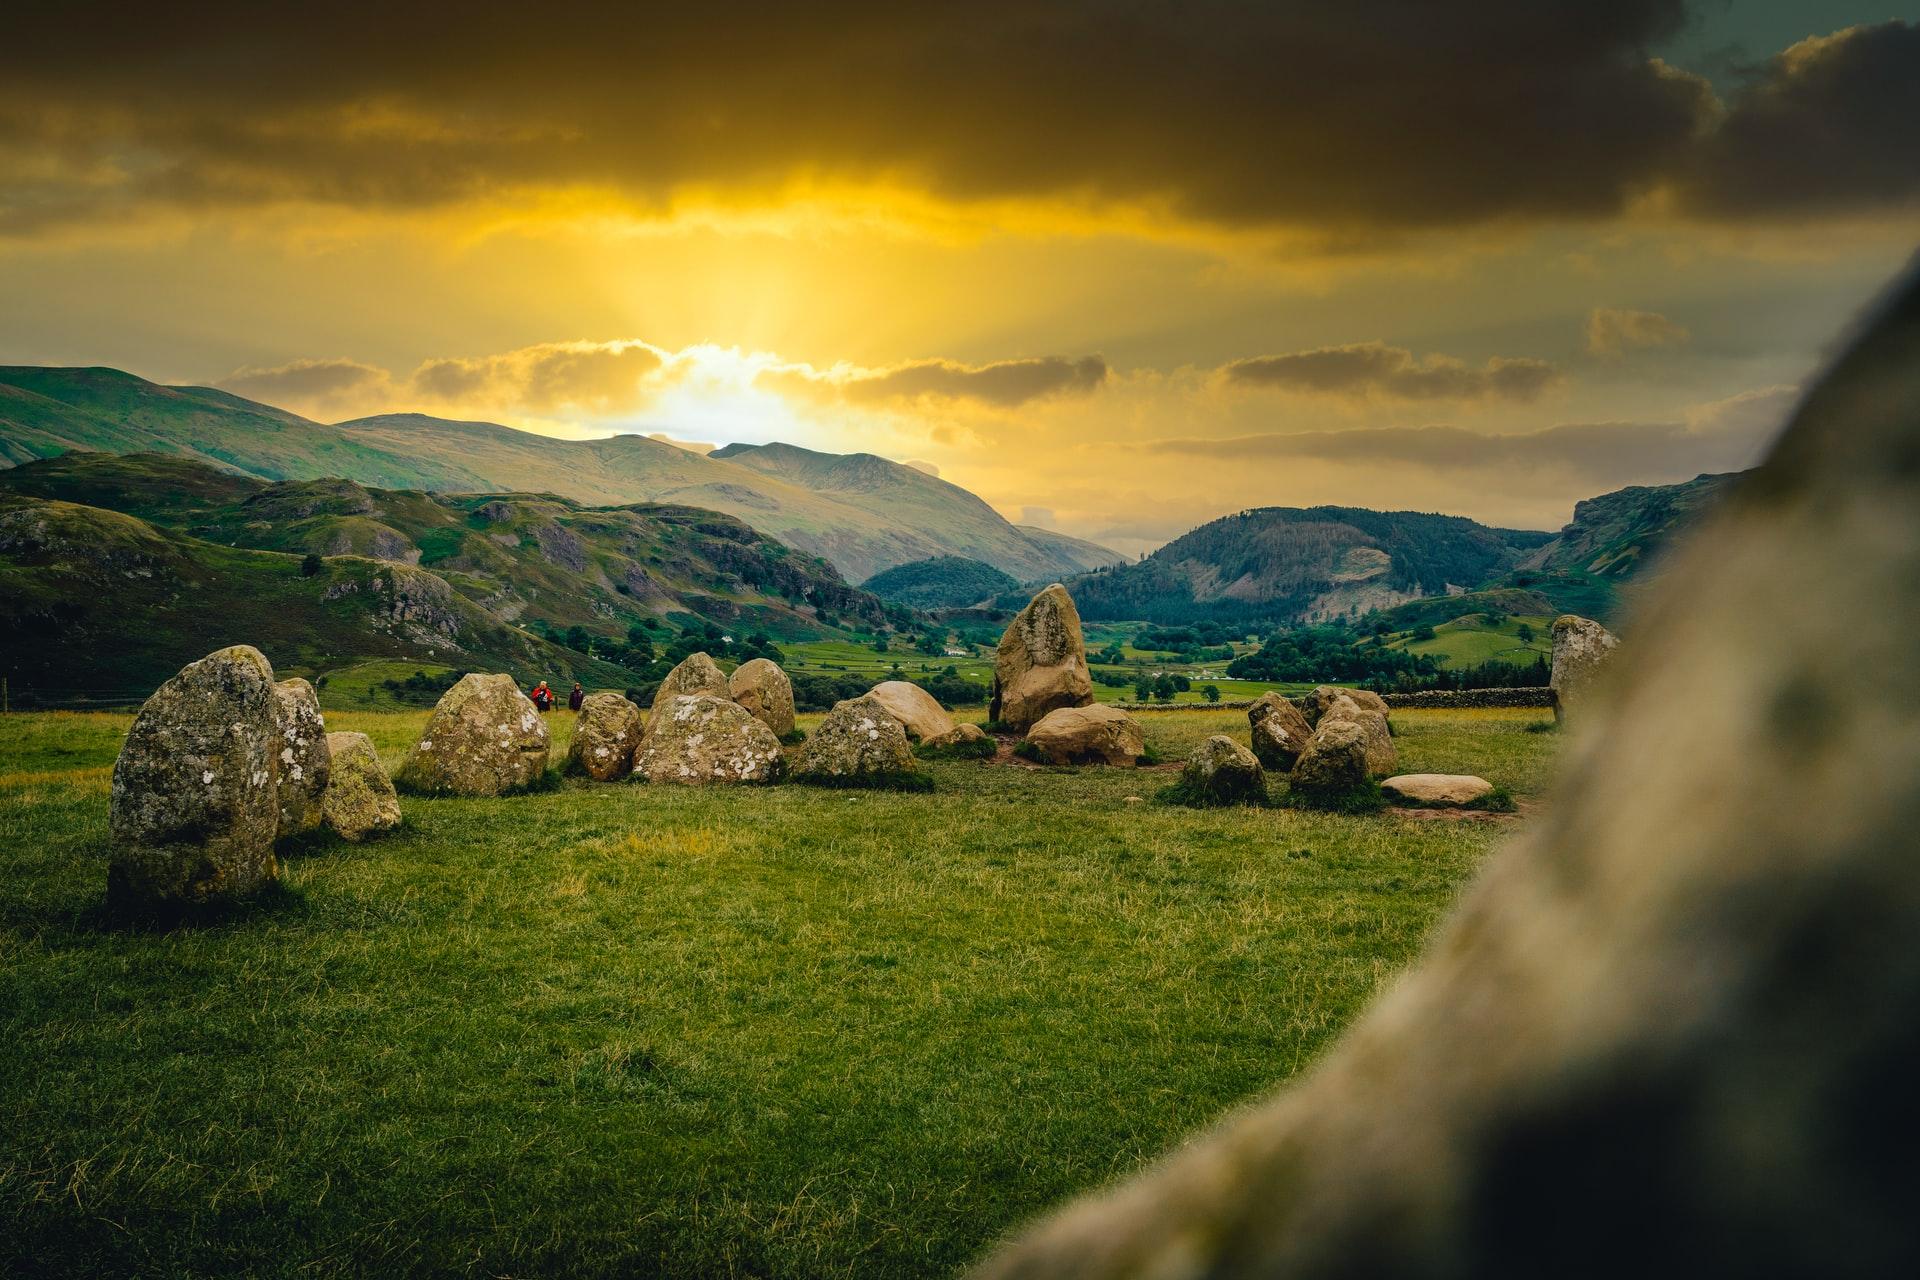 Castlerigg stone circle landscape